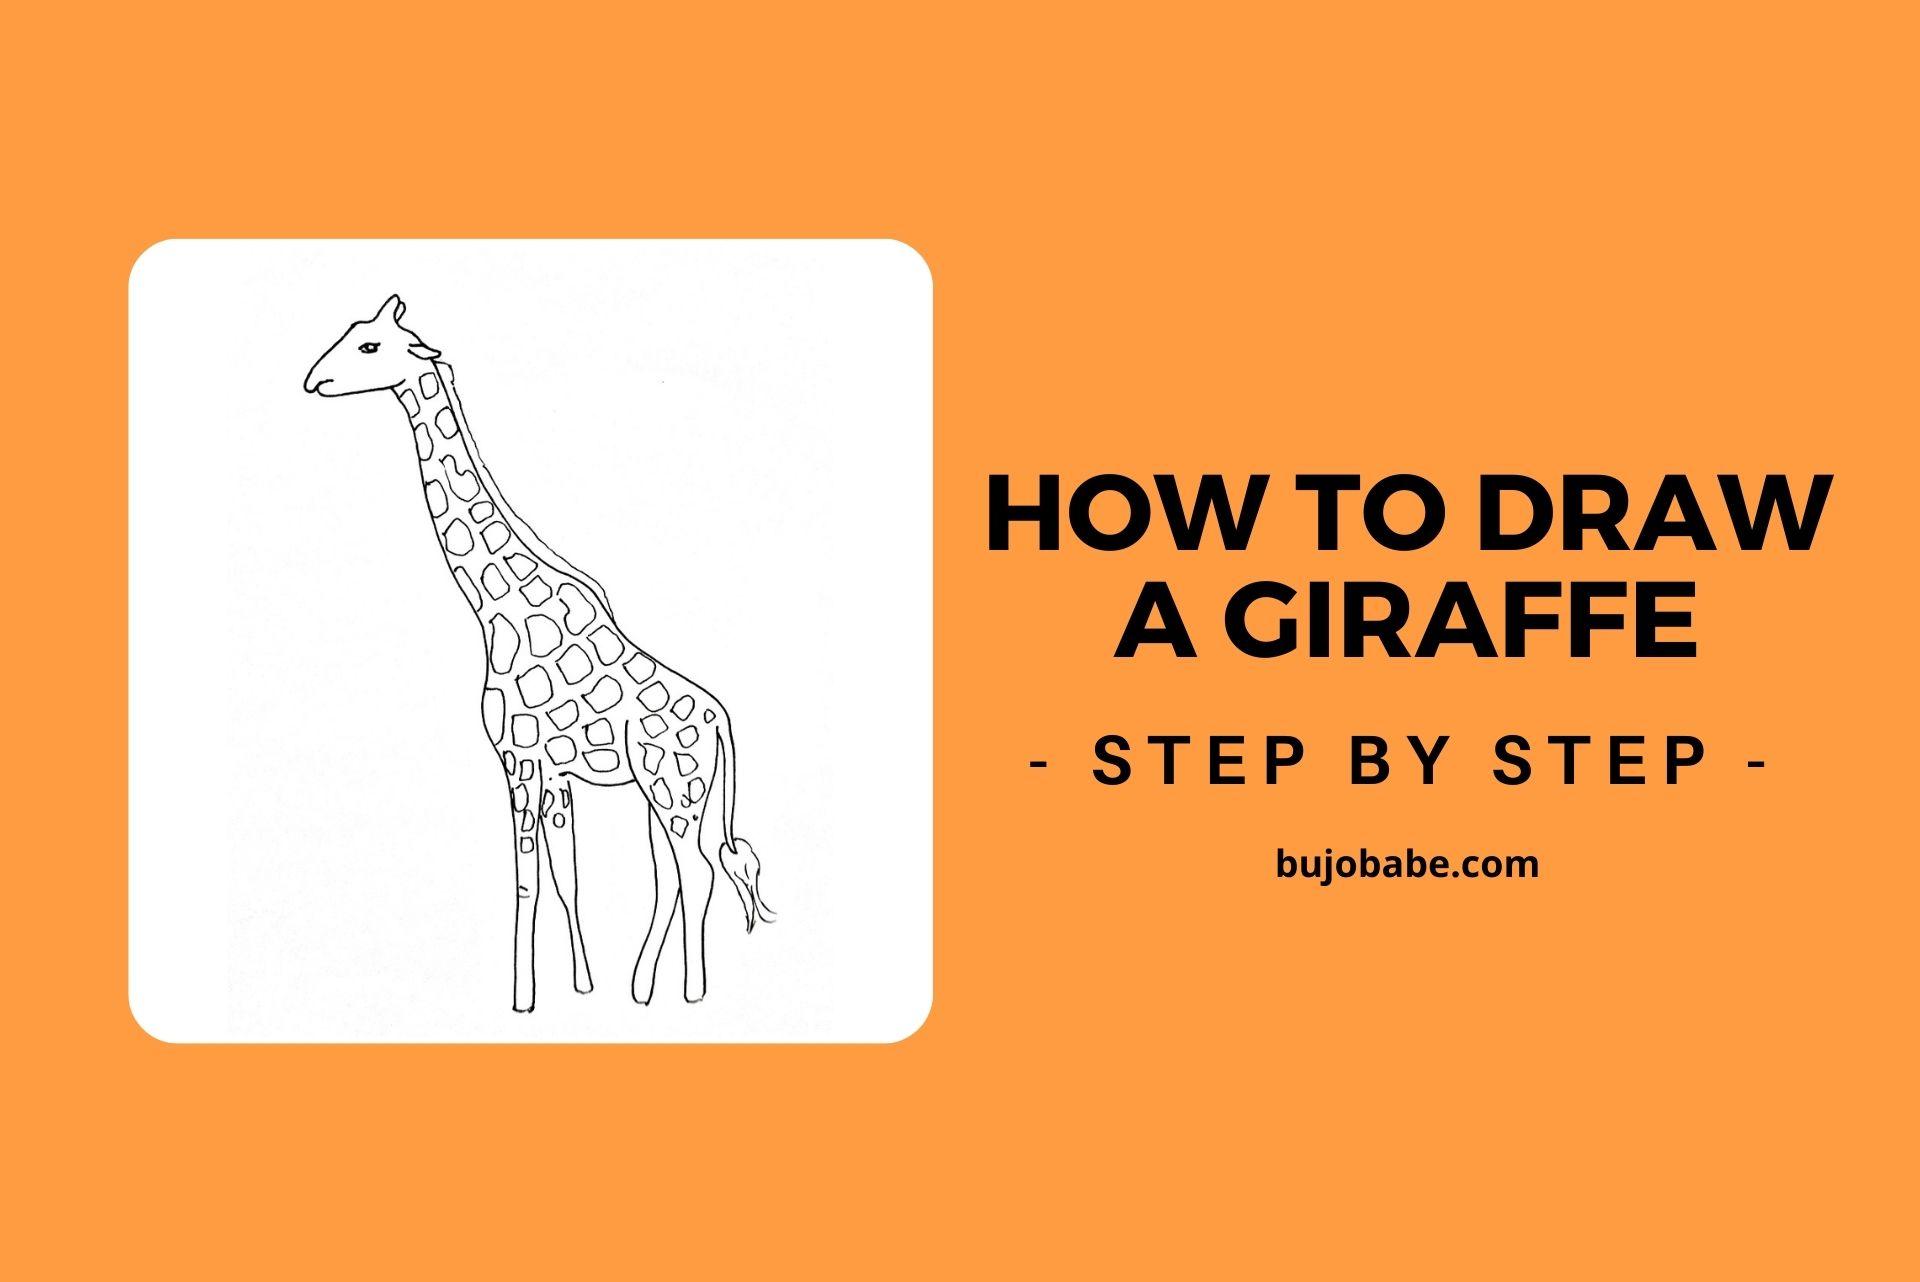 how to draw giraffe step by step